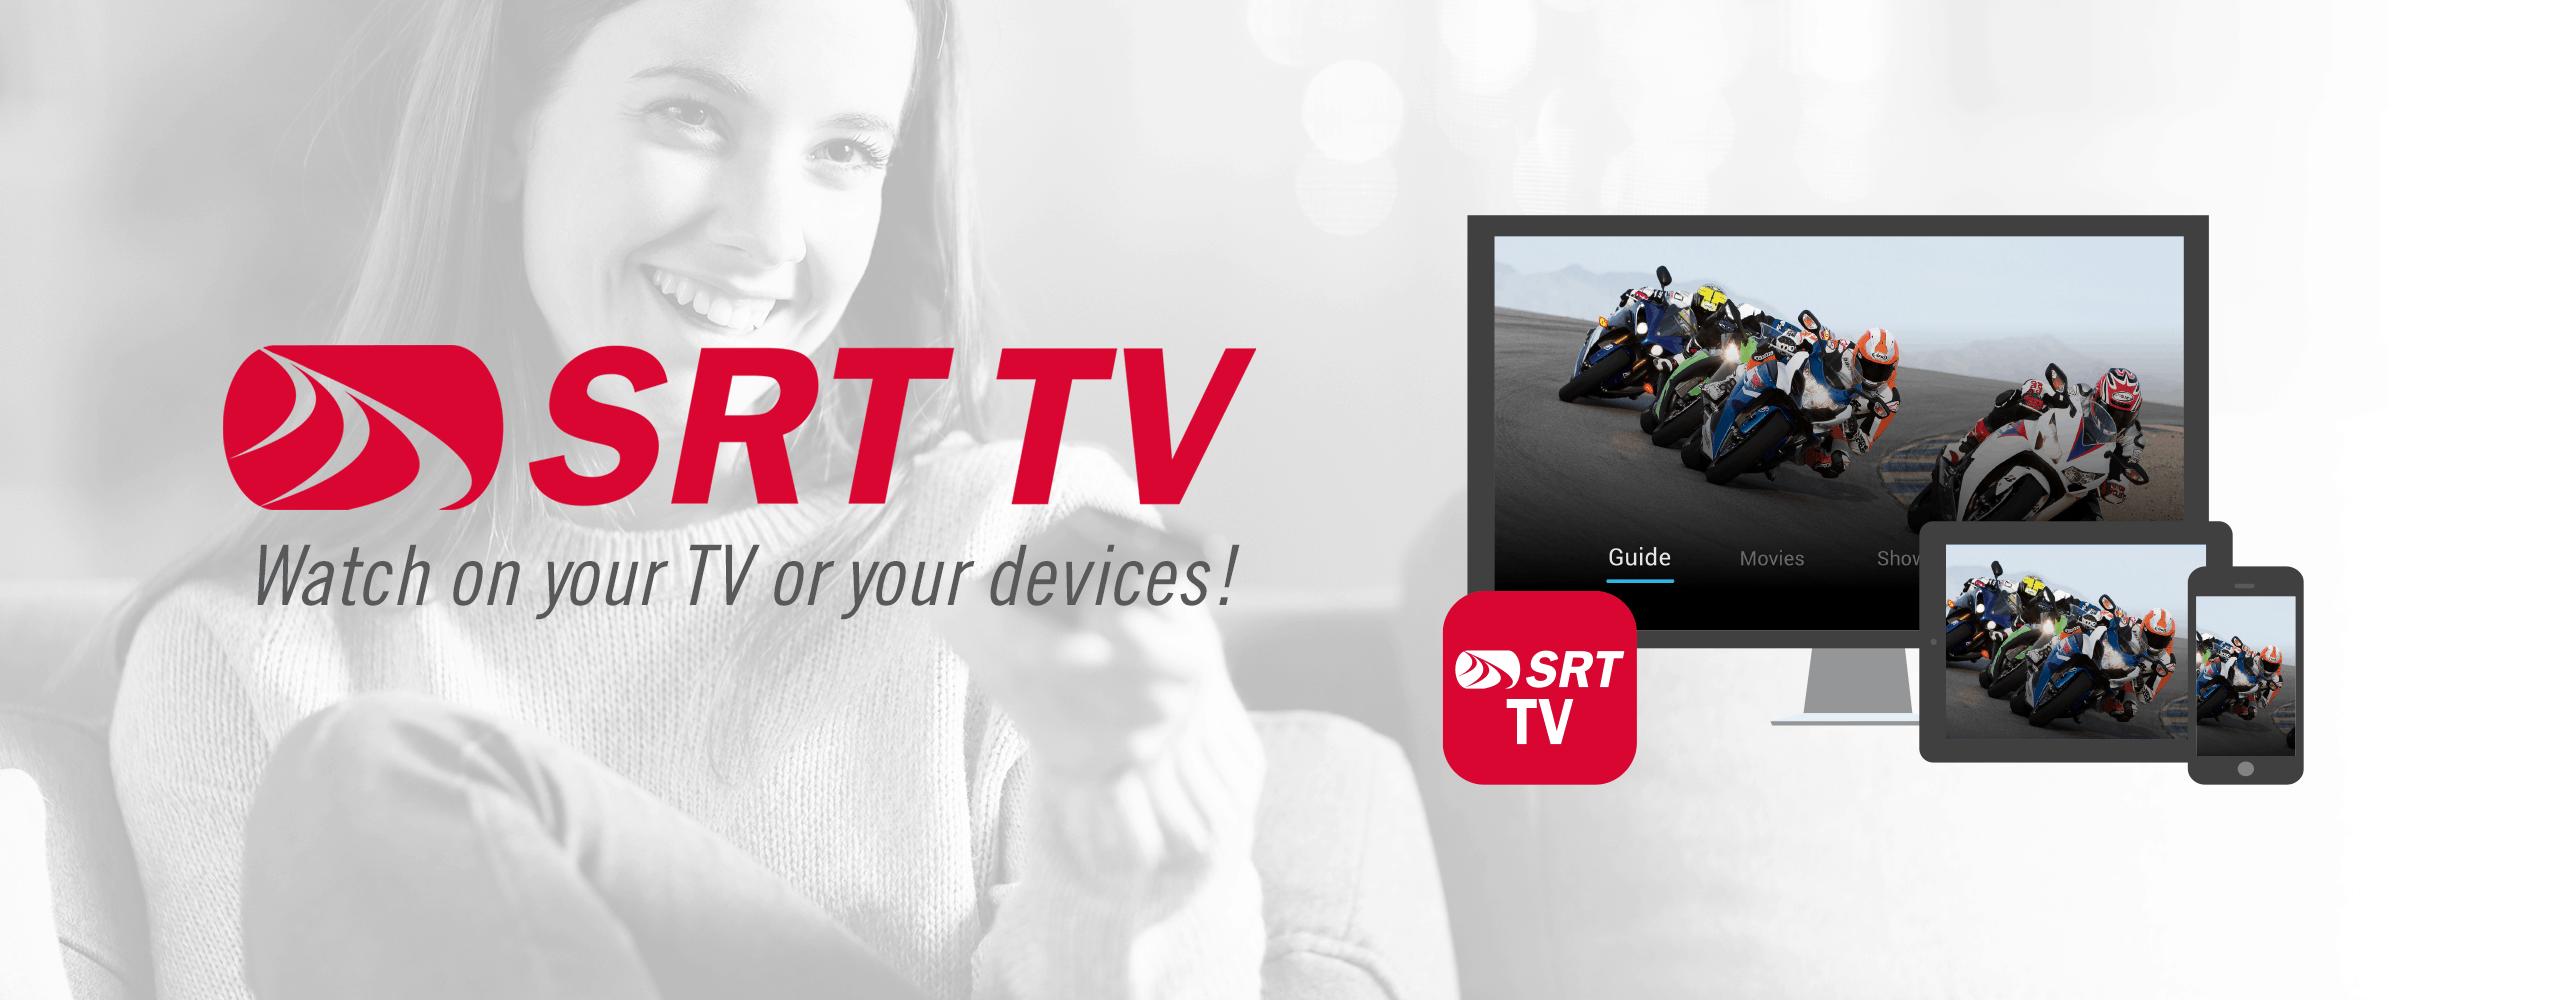 SRTTV_landingpage